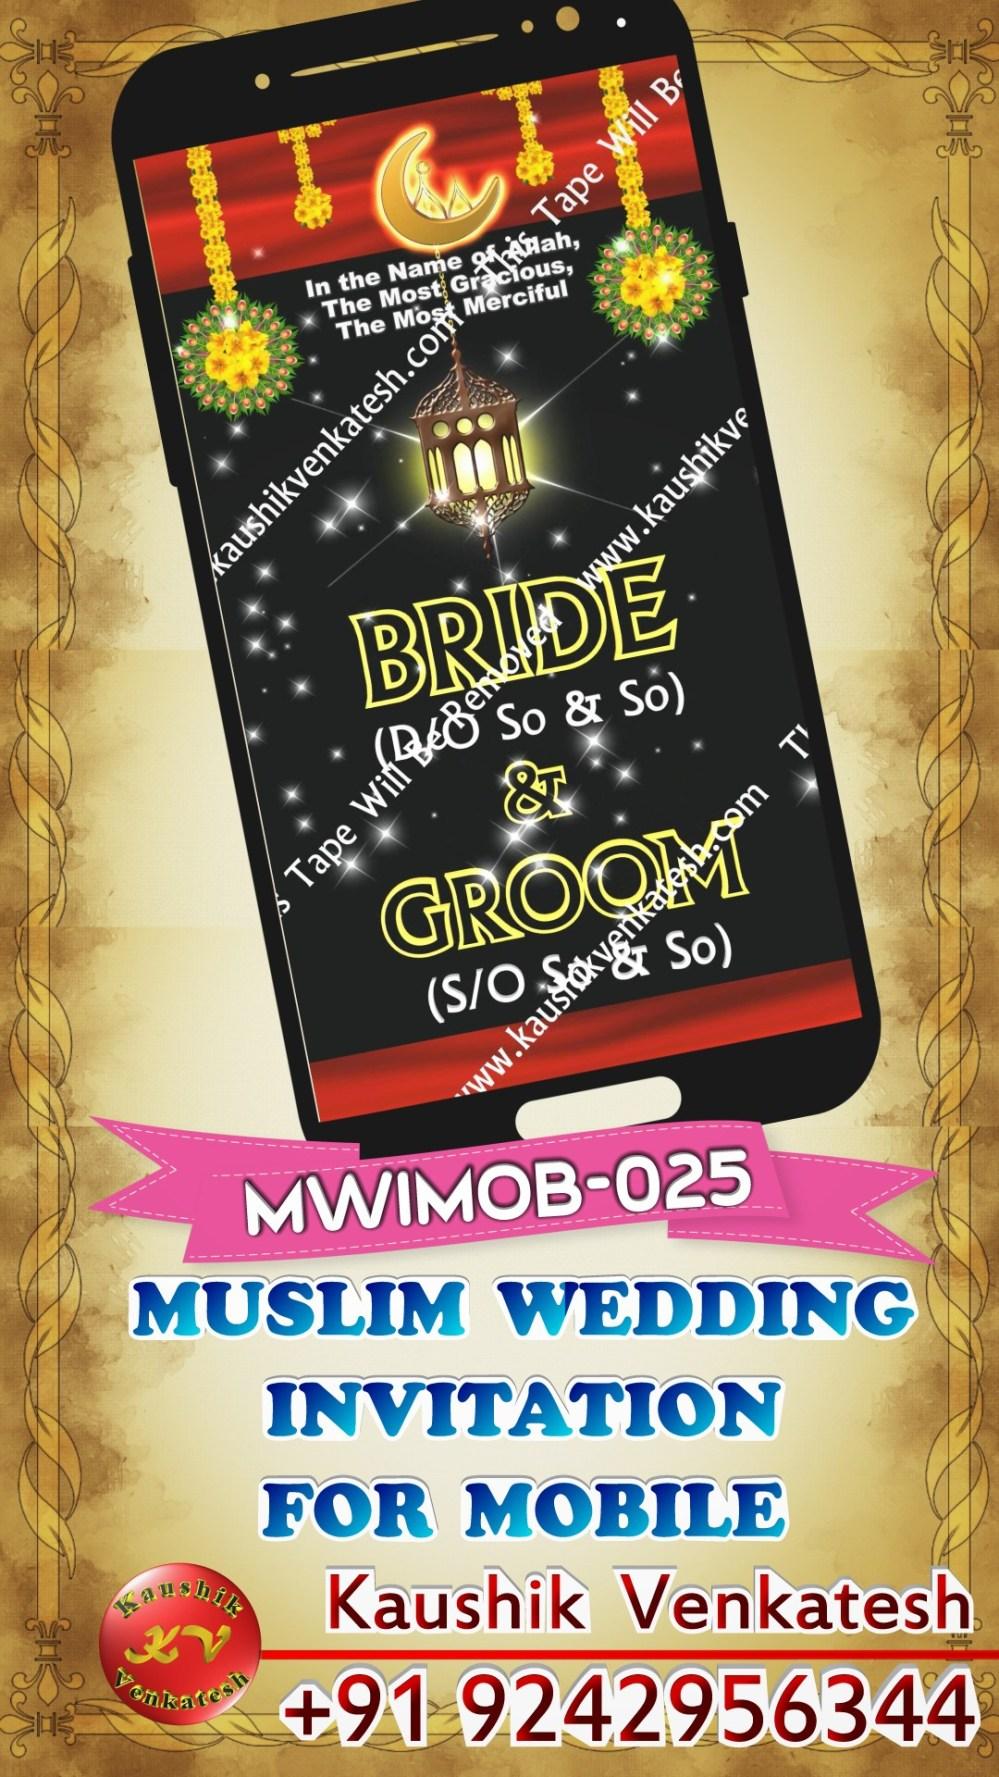 New Wedding Invitation Video